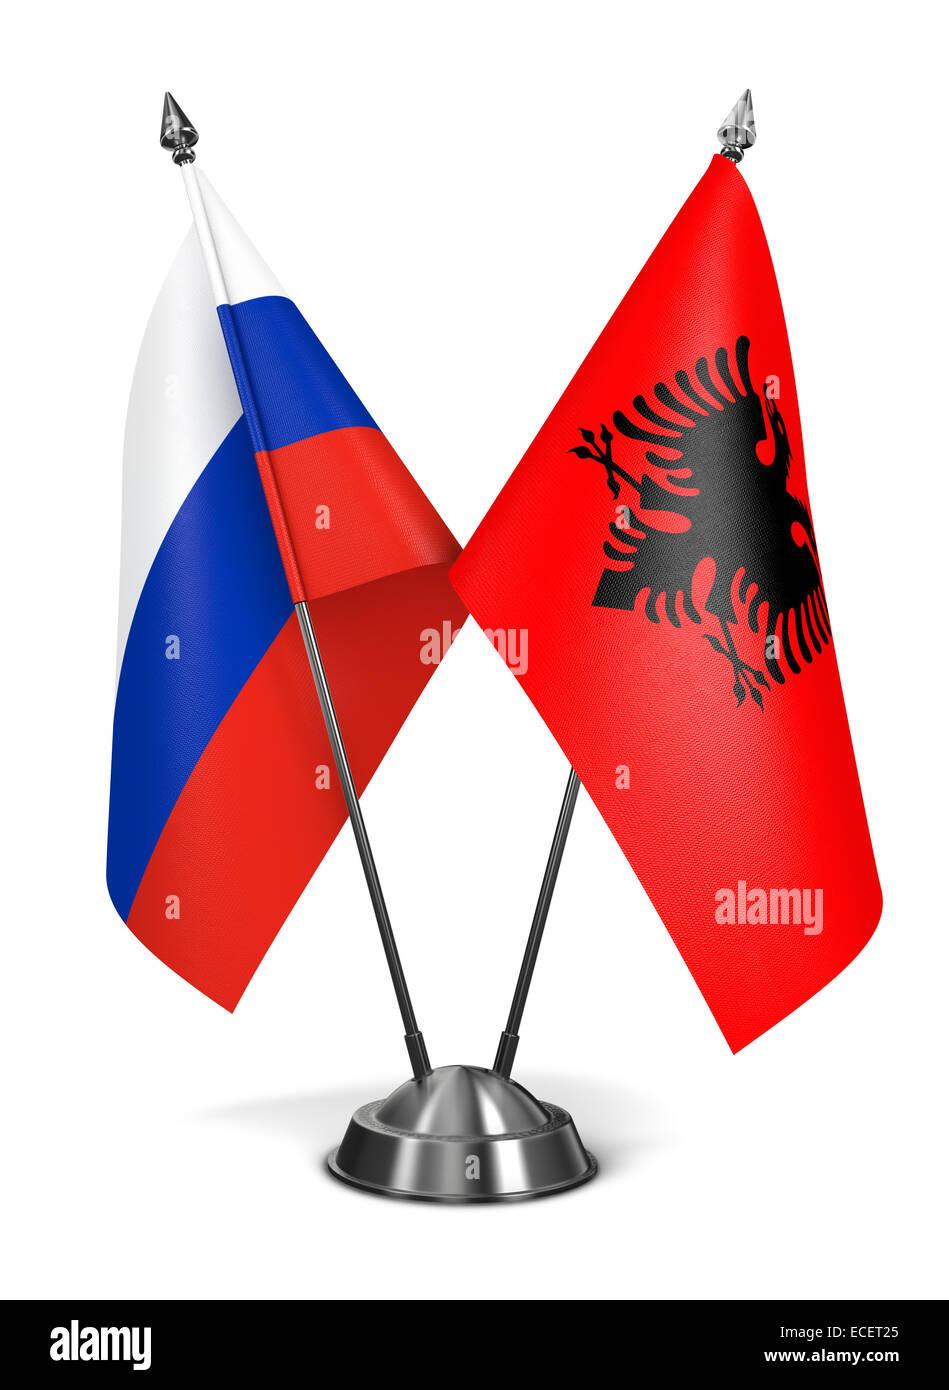 Albania and Russia - Miniature Flags. - Stock Image